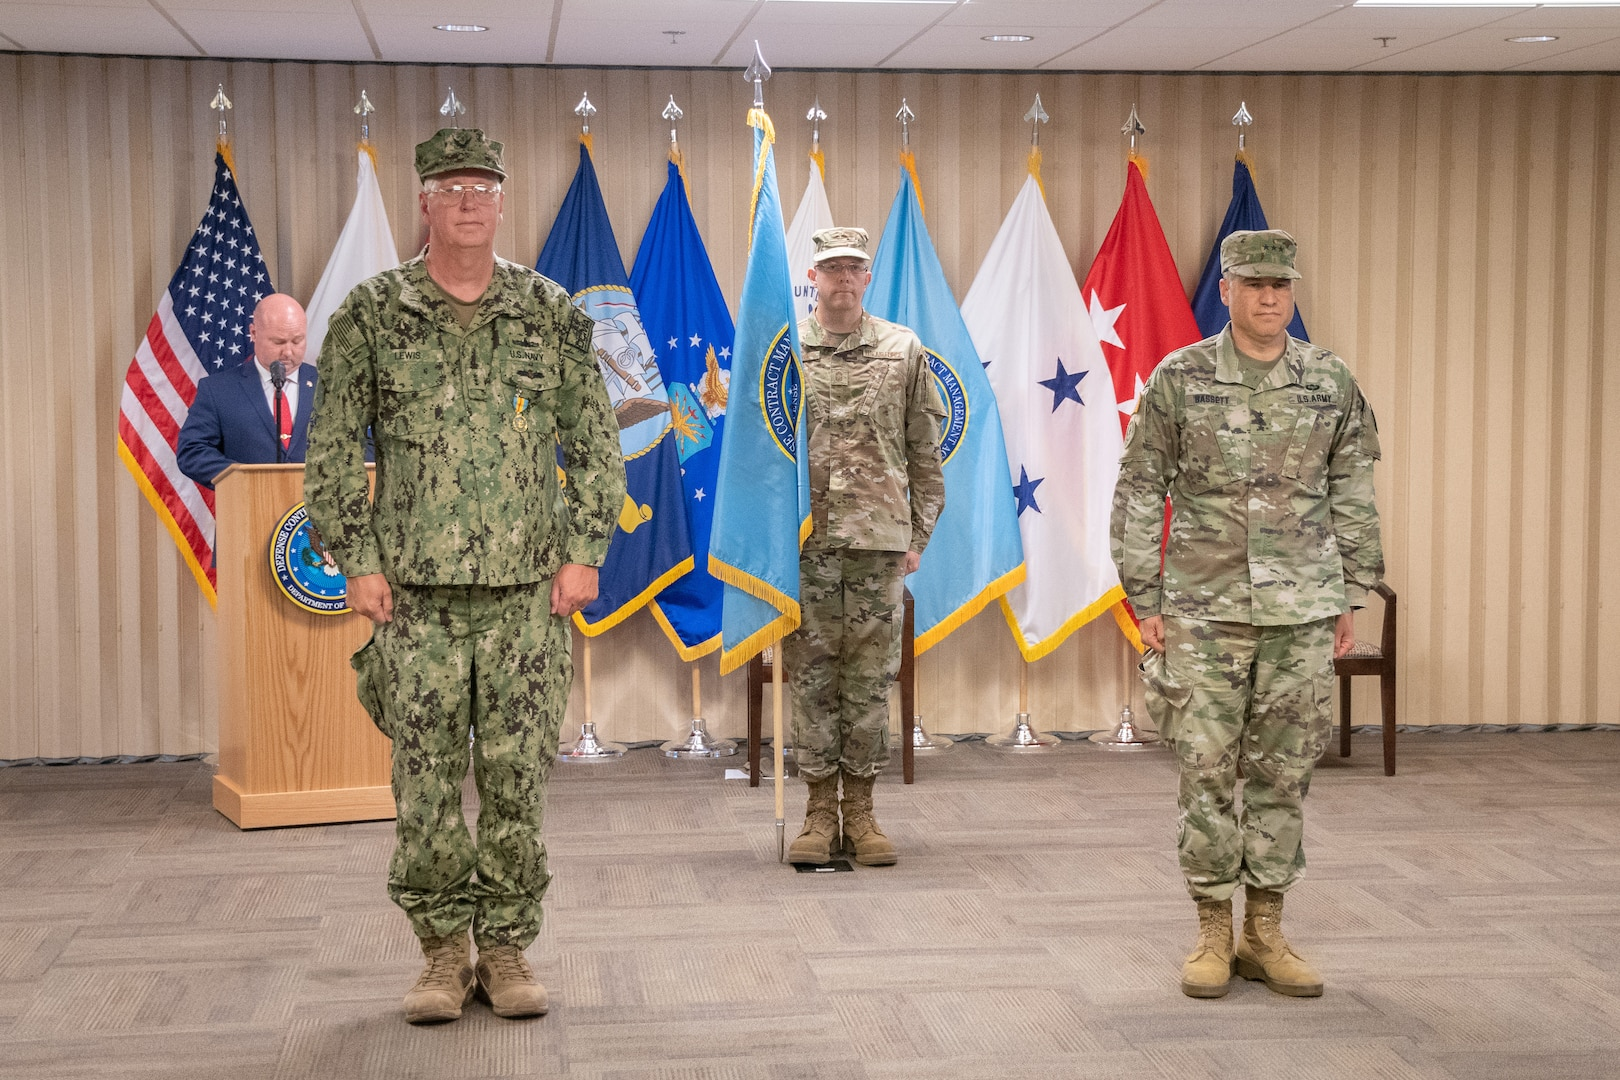 Three men in uniform stand in a formal manner